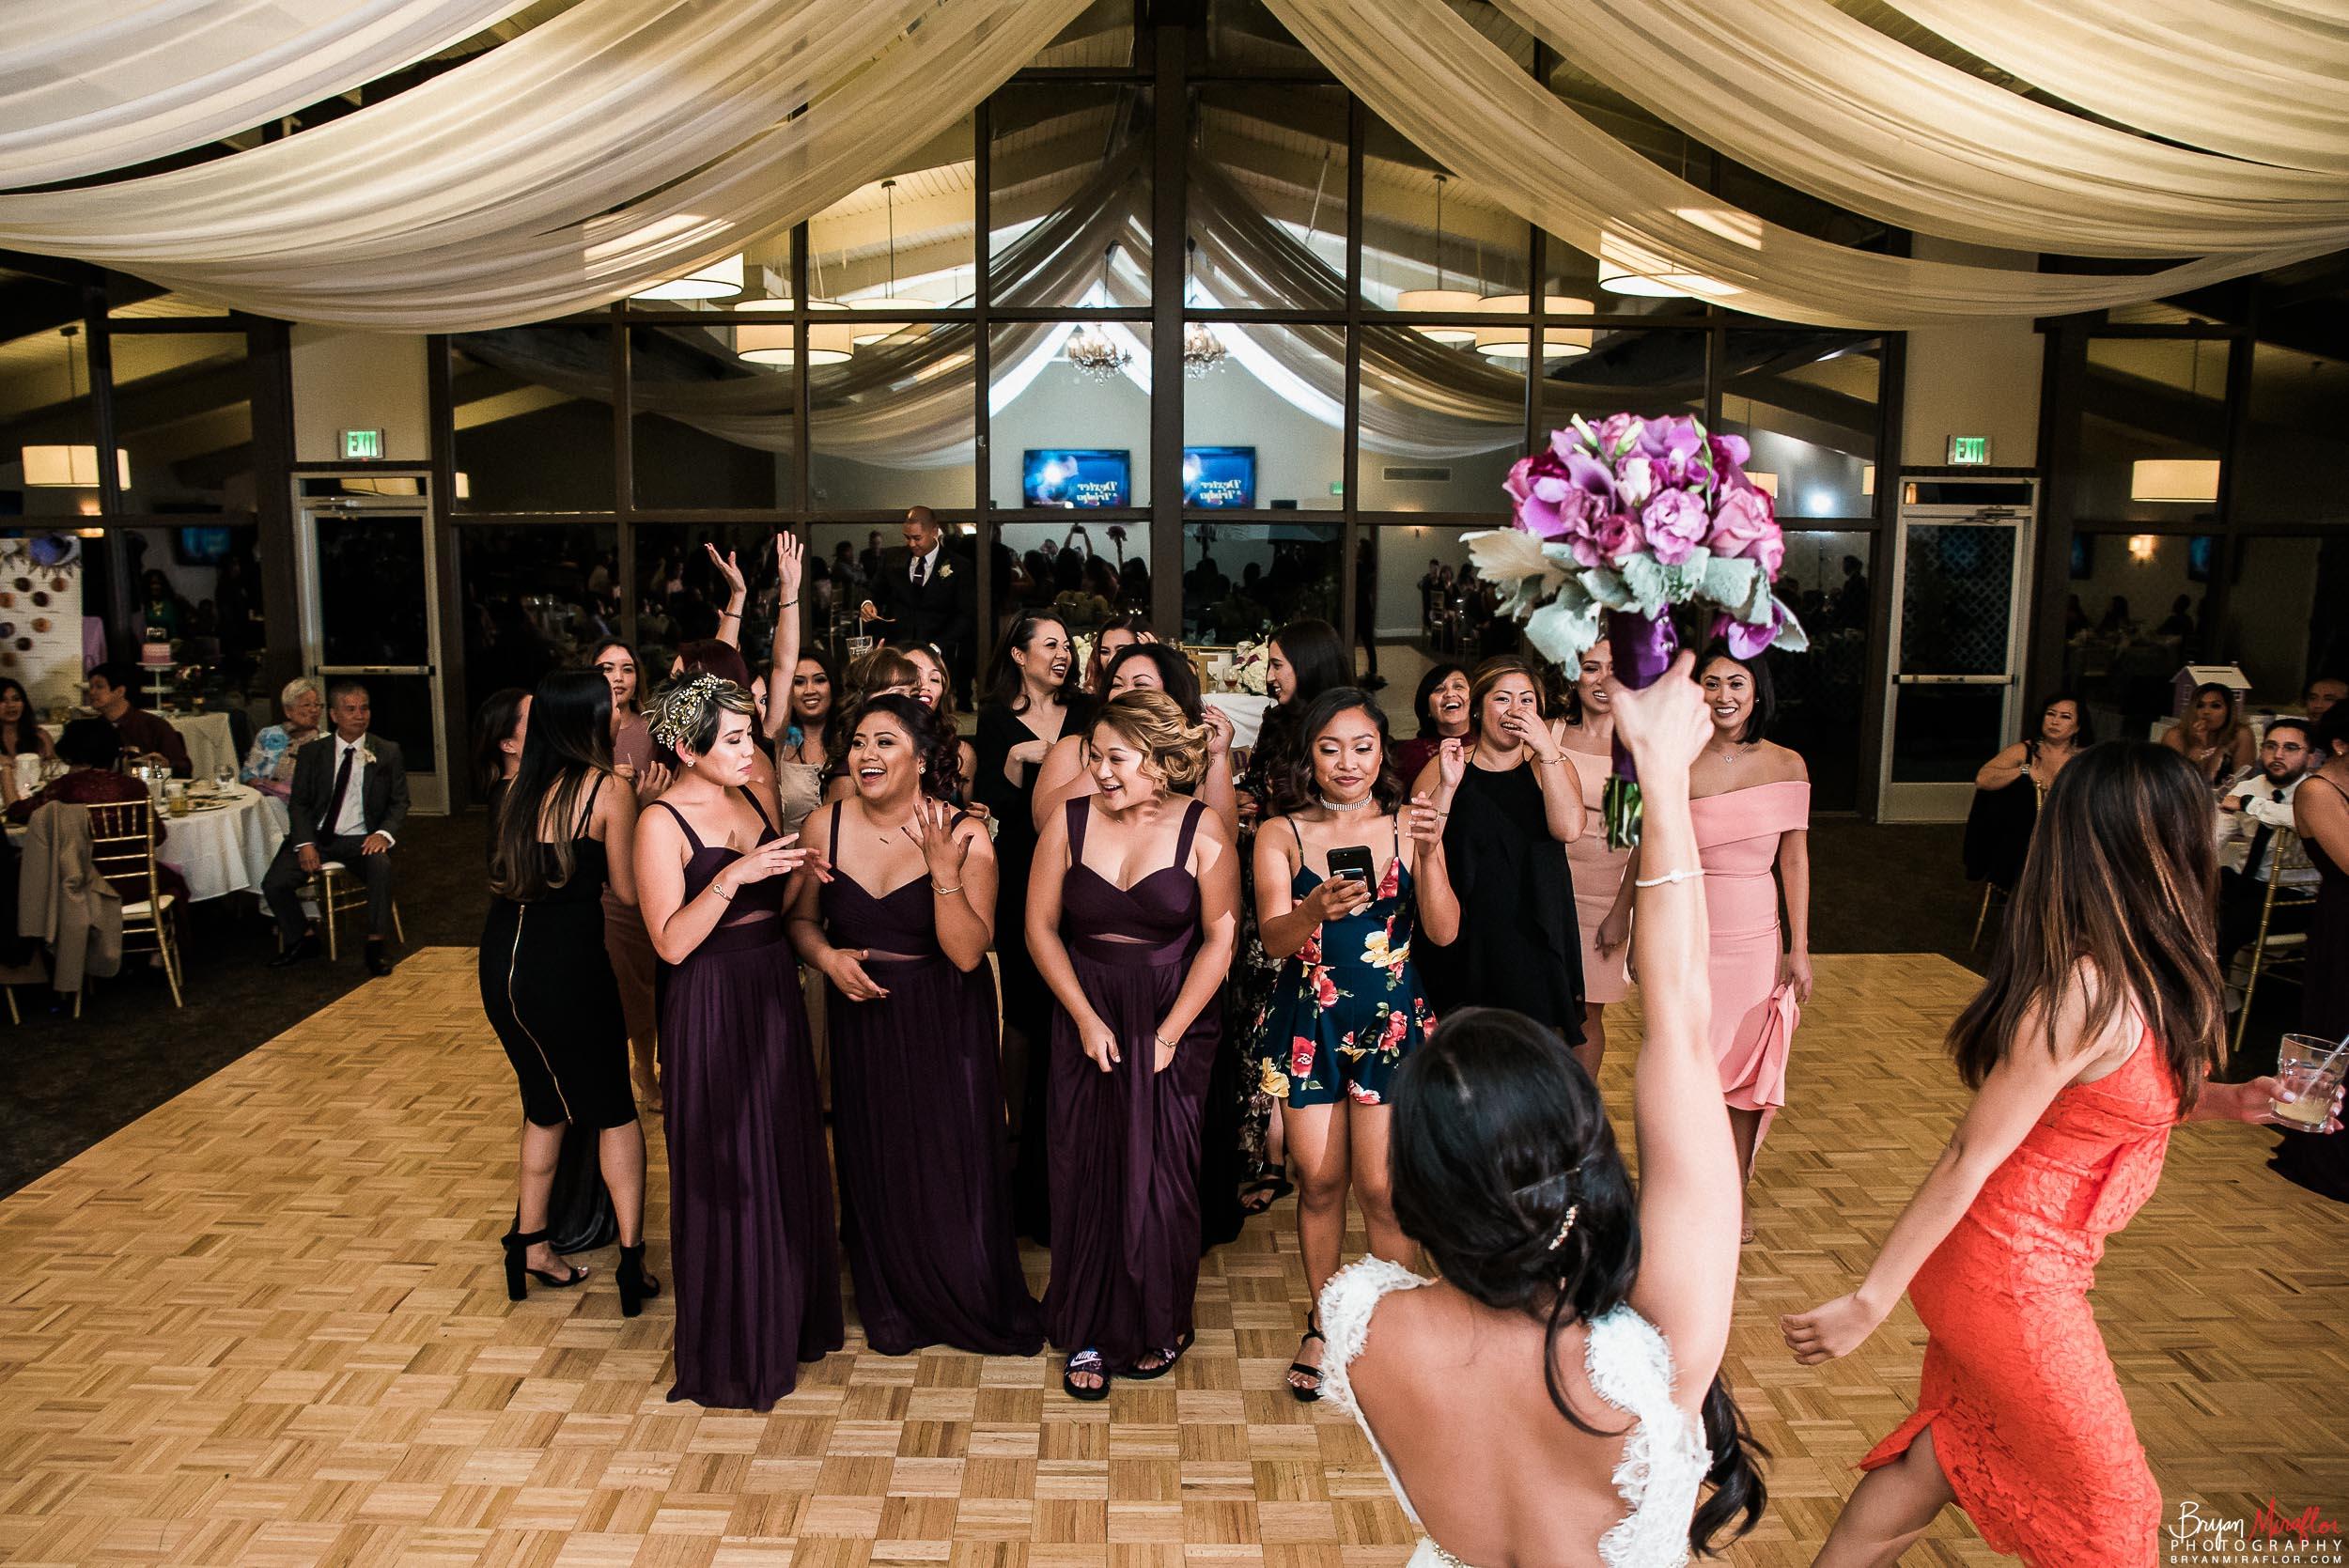 Bryan-Miraflor-Photography-Trisha-Dexter-Married-20170923-071.jpg